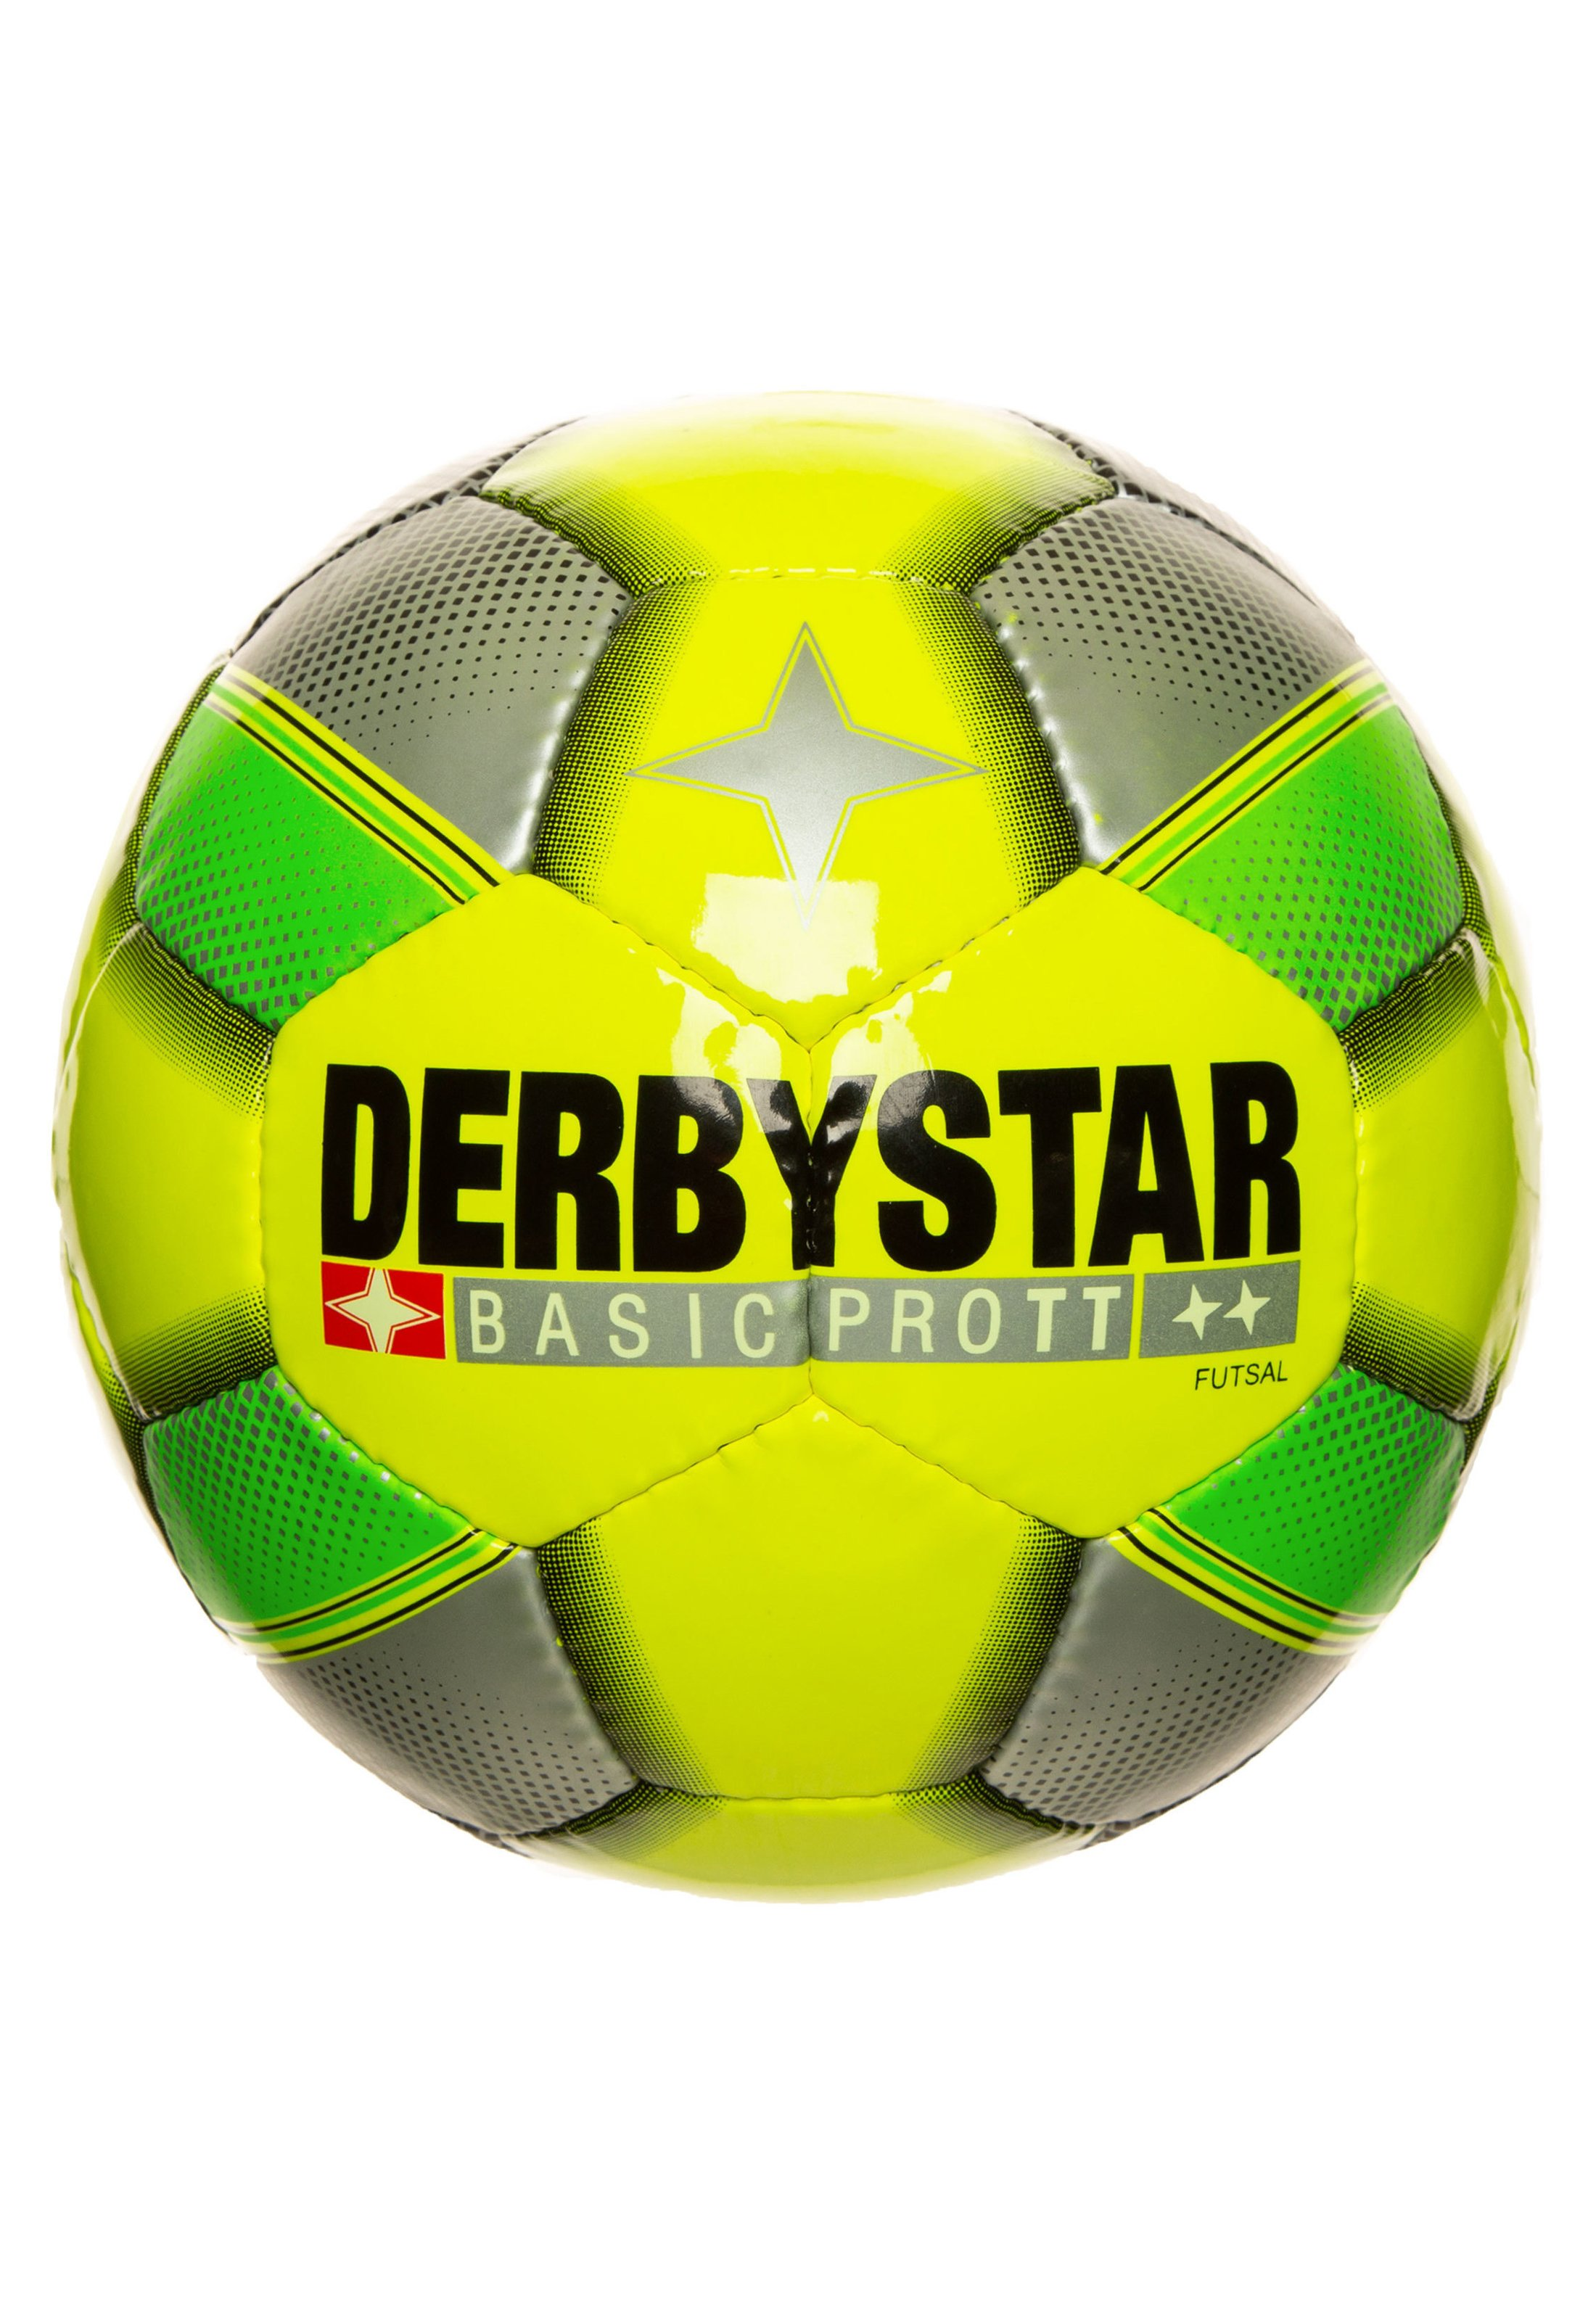 Herren BASIC PRO TT FUTSAL FUSSBALL - Fußball